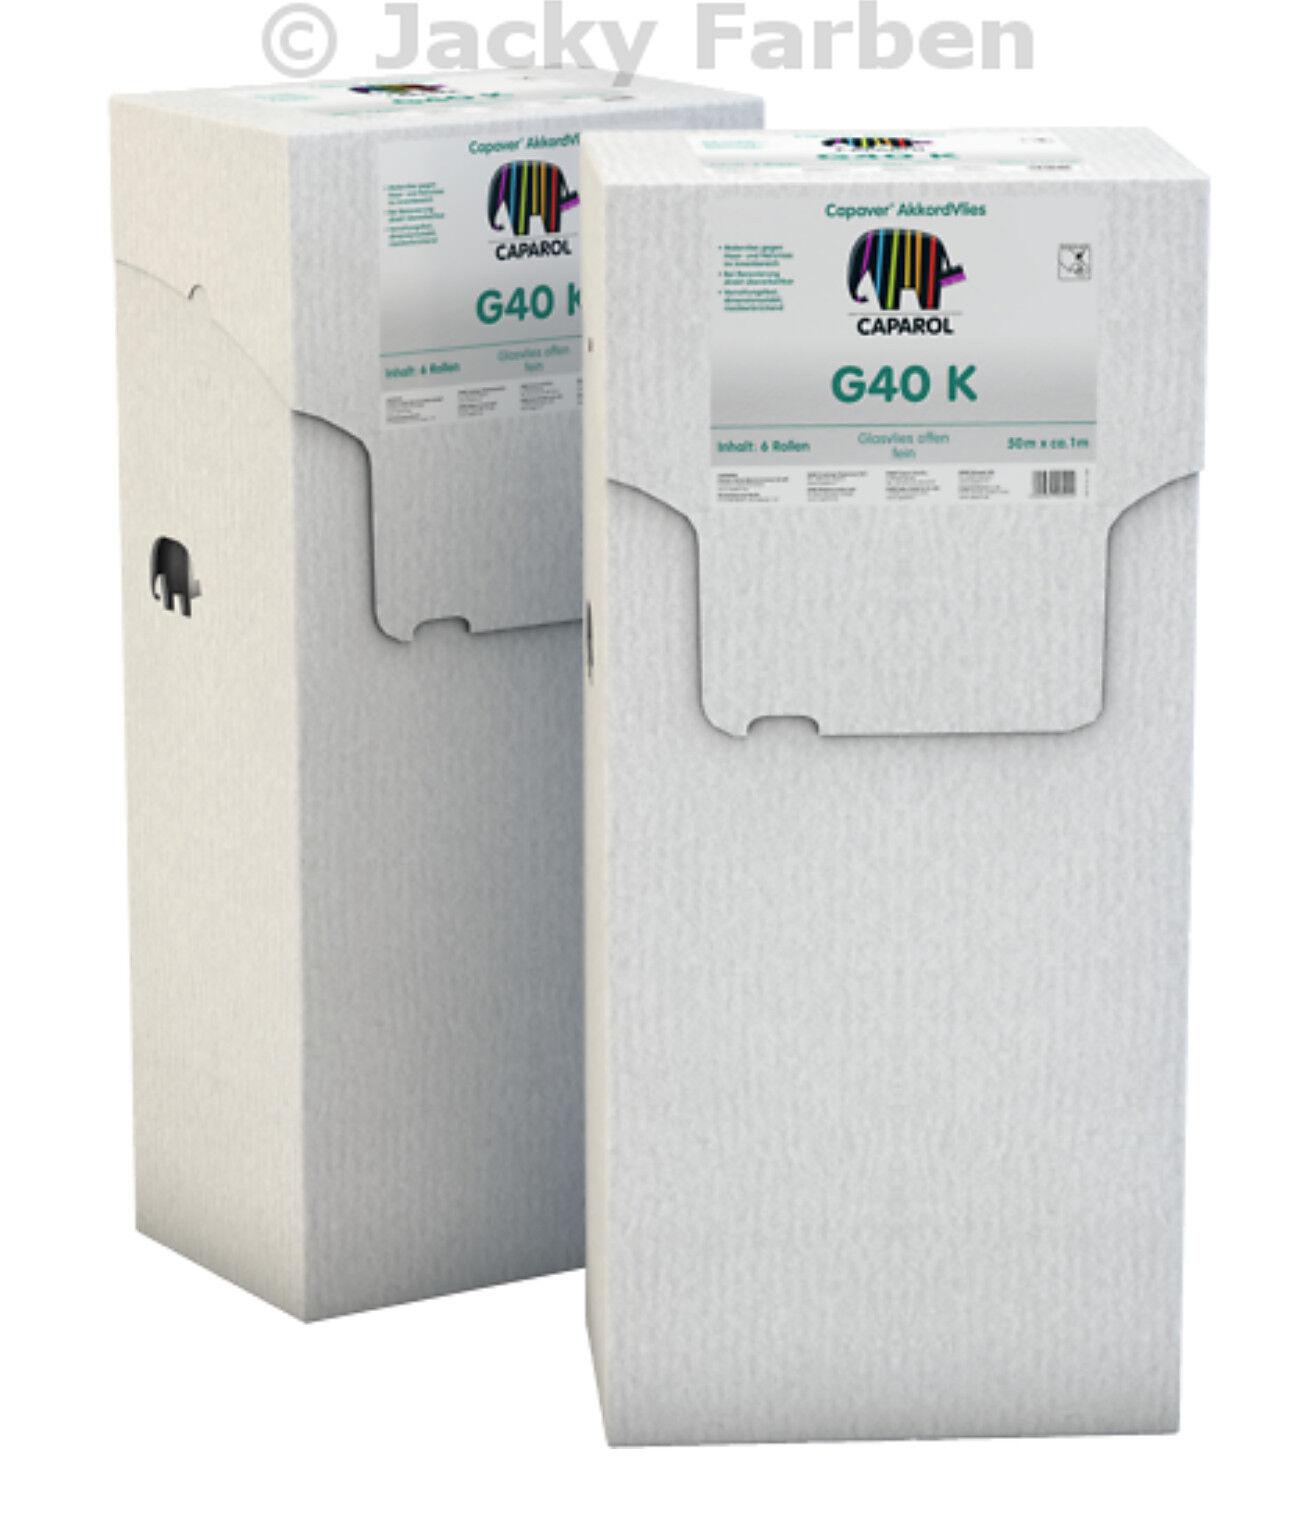 Angebot Caparol AkkordVlies G 40 K 50qm Glasfasergewebe Glasgewebe Glas Gewebe